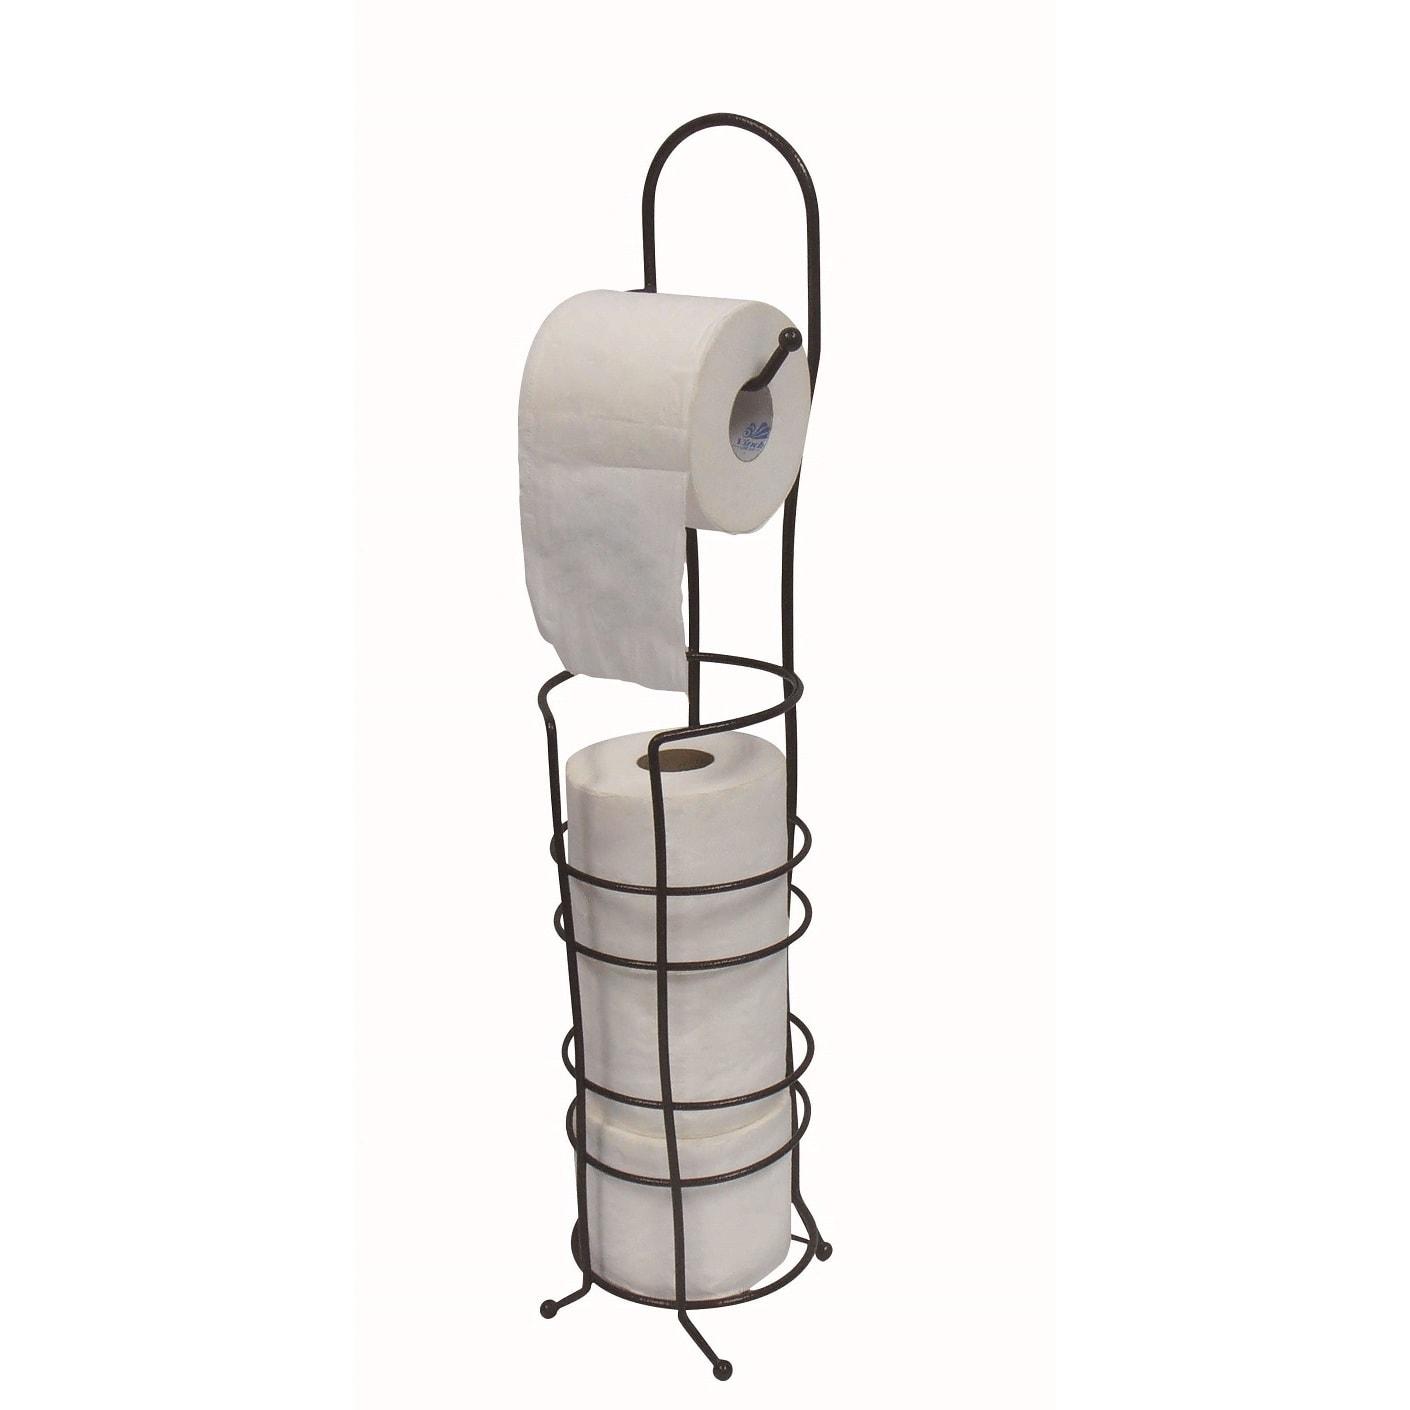 Free Standing Toilet Paper Holder Overstock 12512665